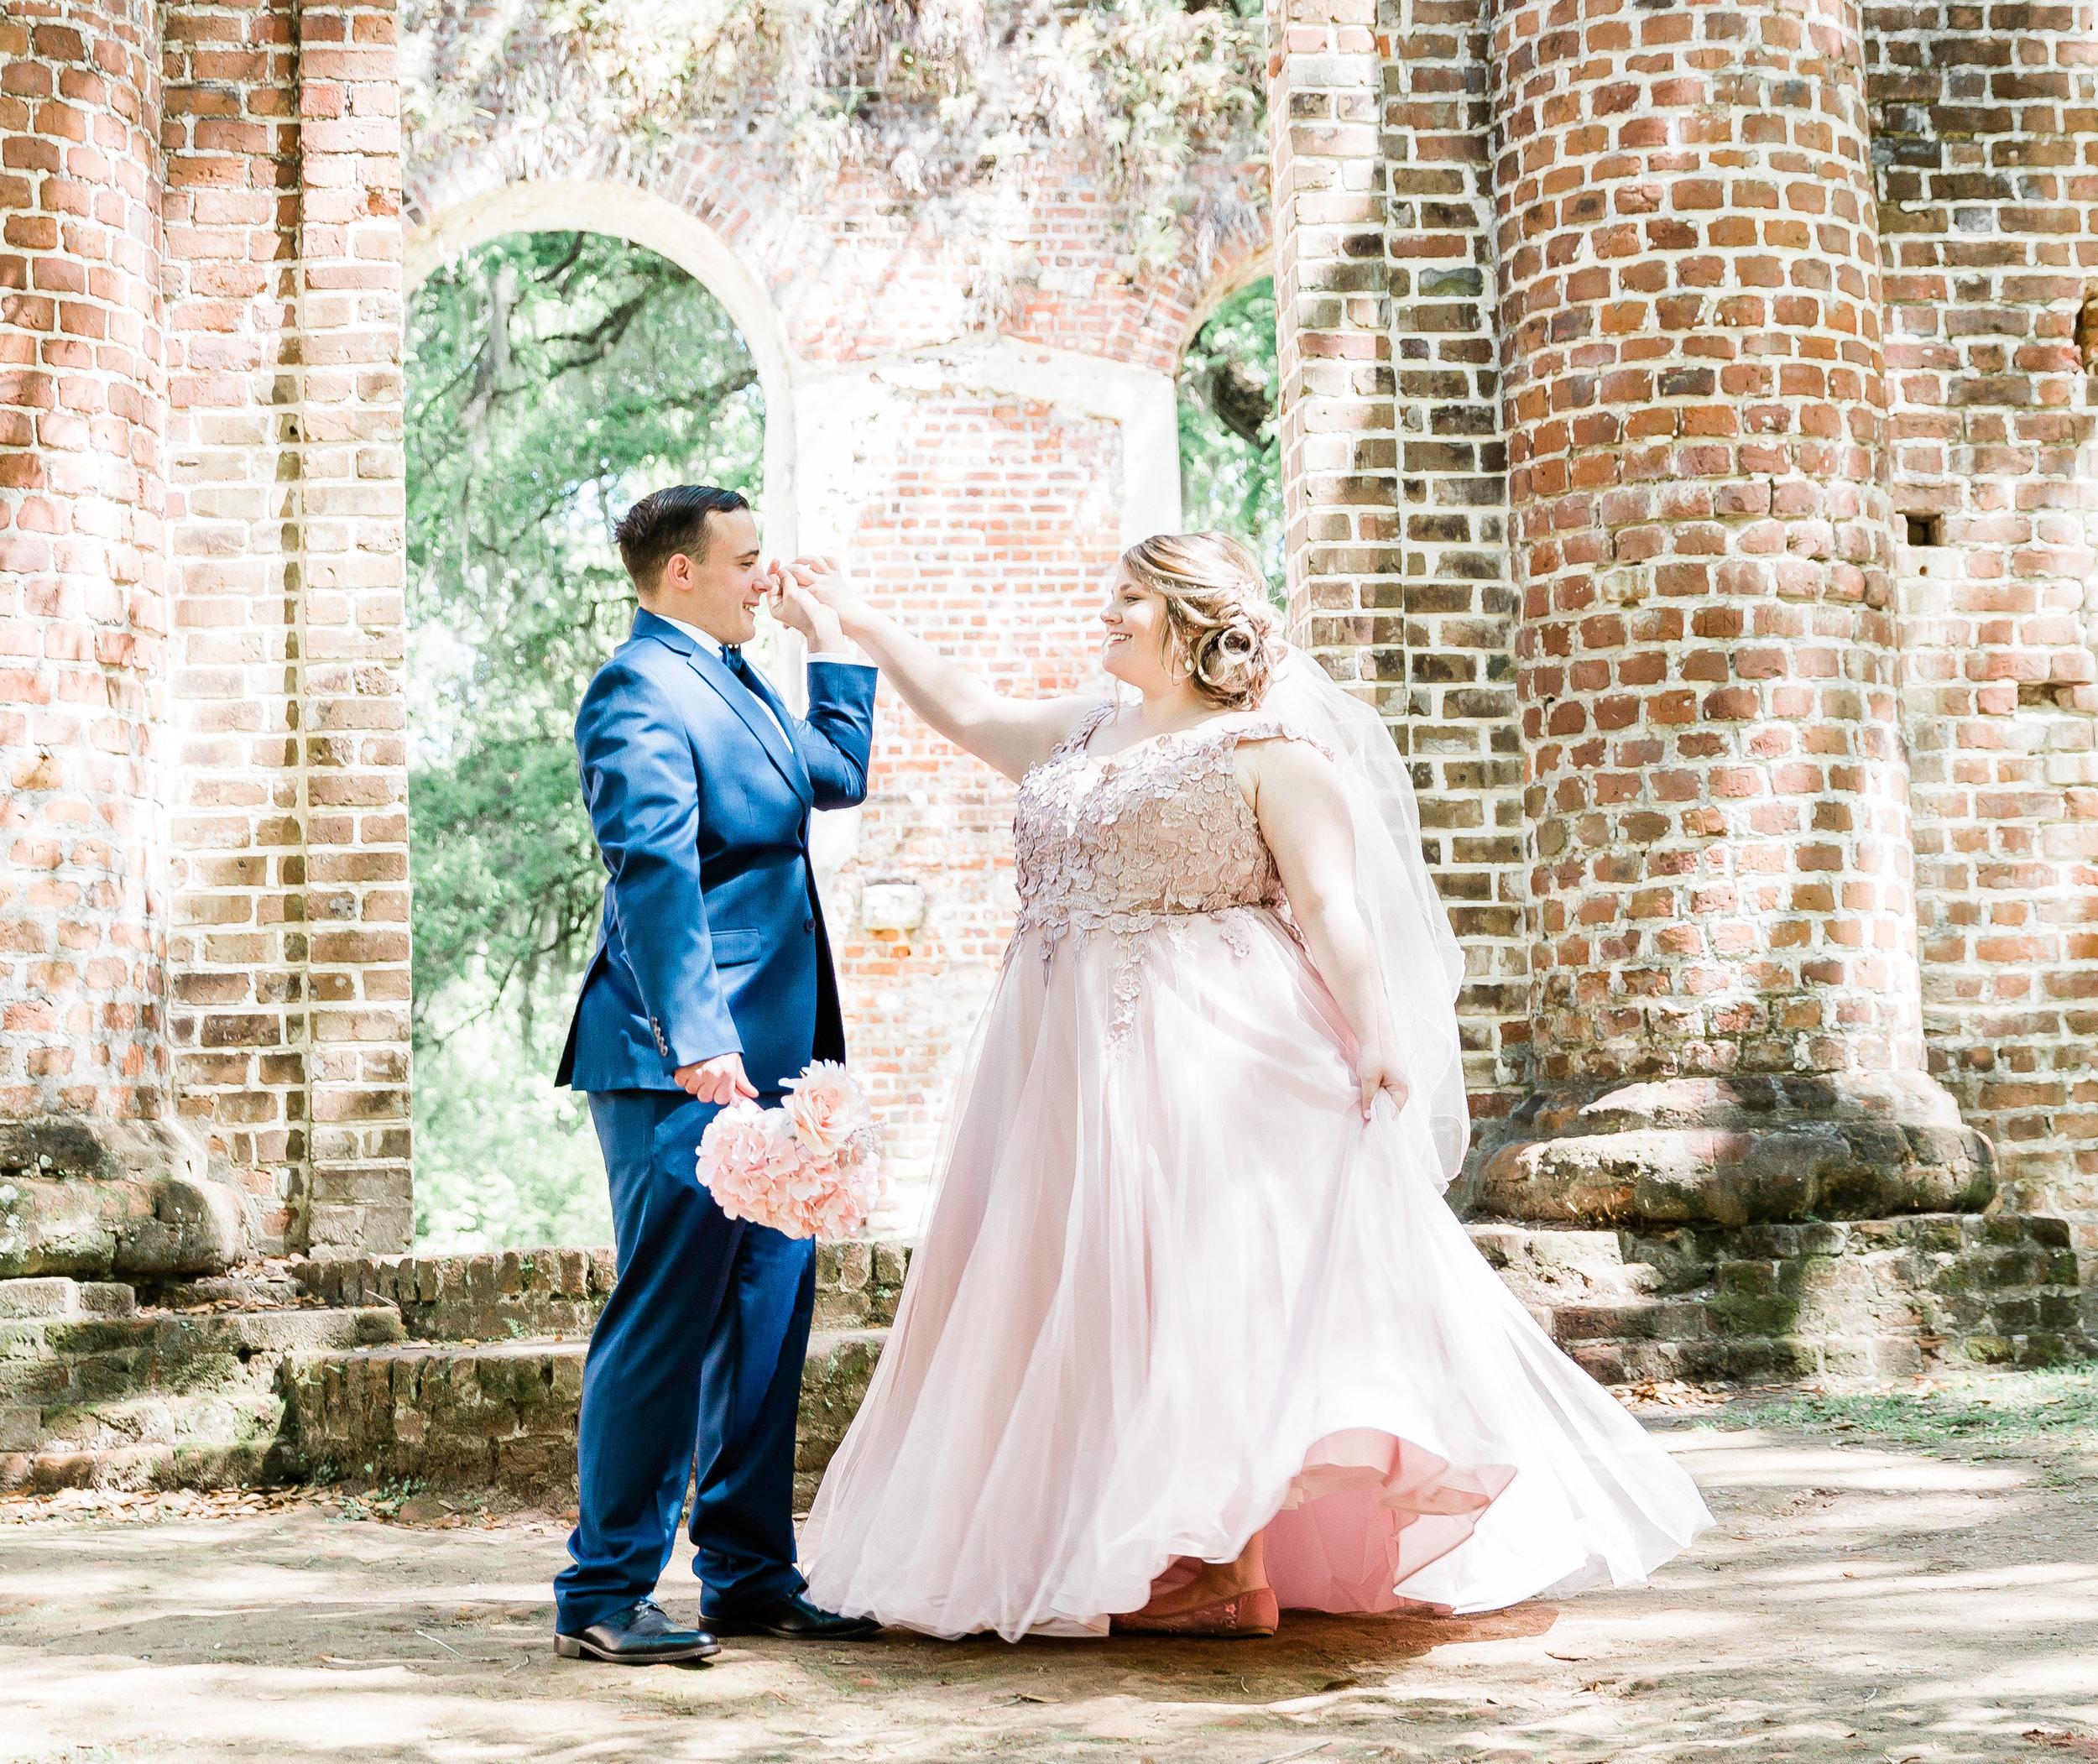 20190417-Southern Lens Photography-savannah family photographer- Ashley and Zack-old sheldon church ruins-201945.jpg